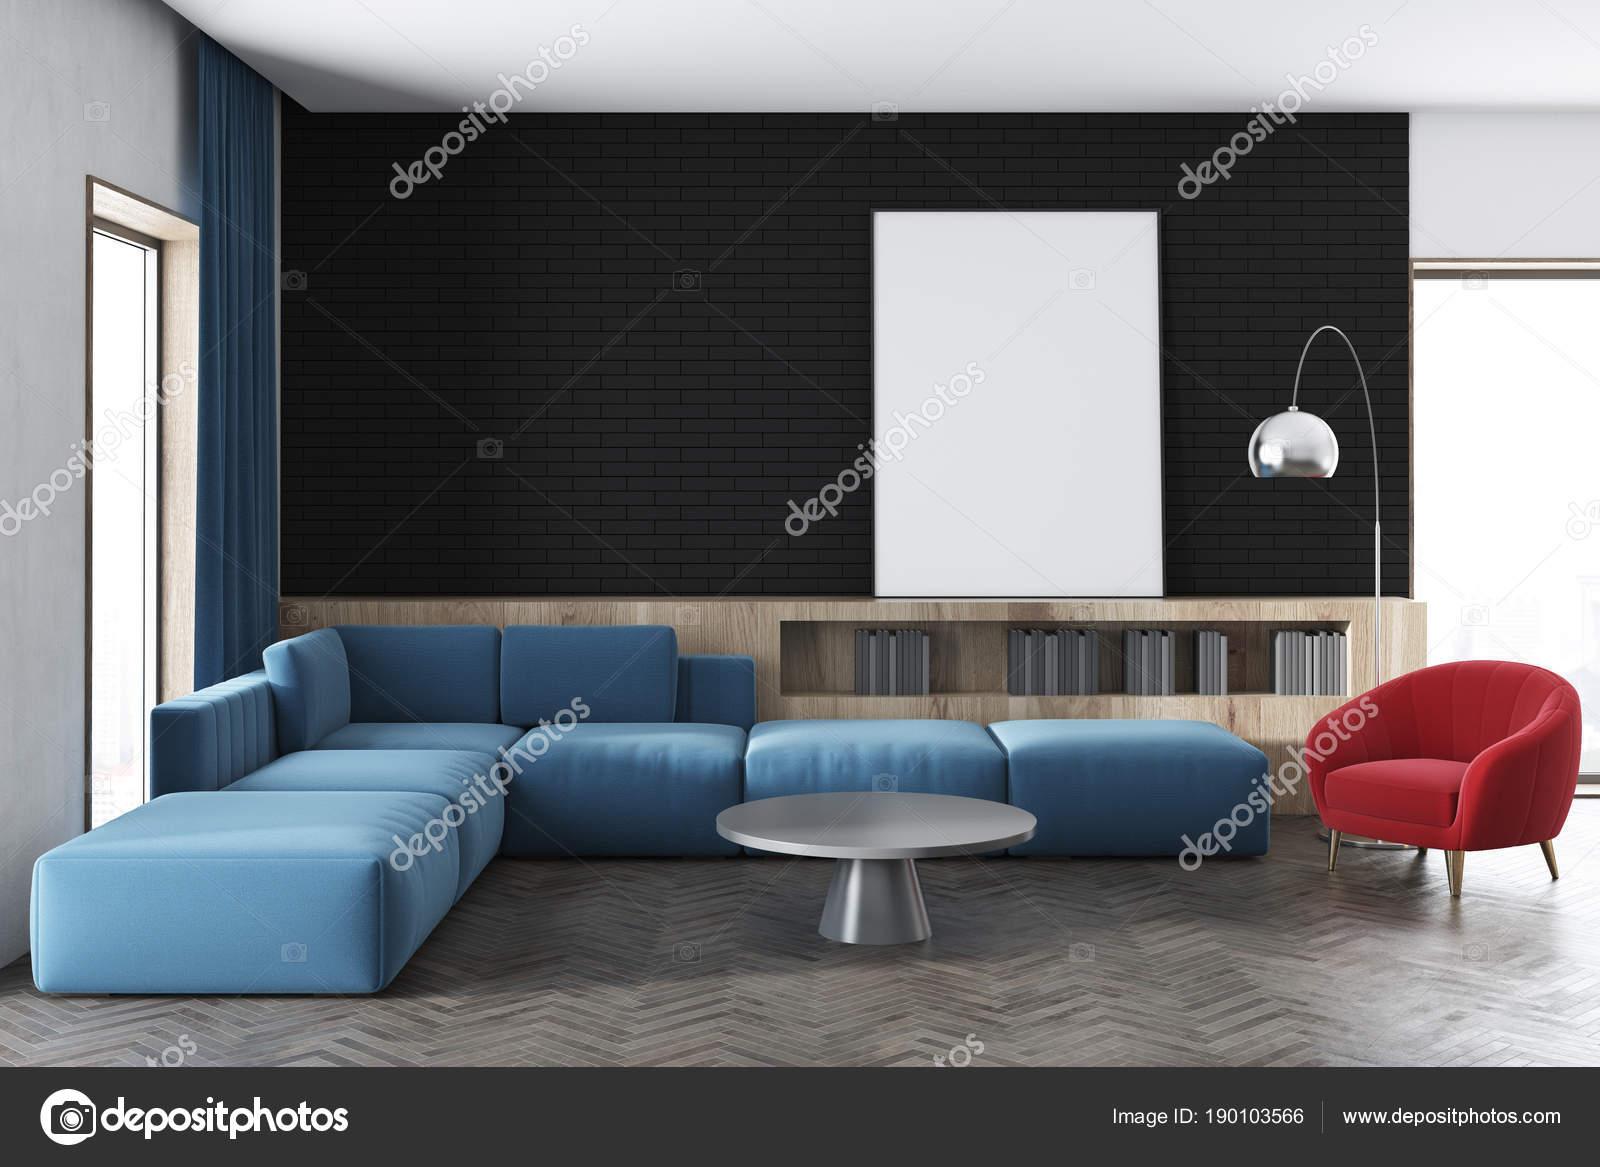 Woonkamer Zwarte Muur : Zwarte muur woonkamer blauwe sofa poster u stockfoto